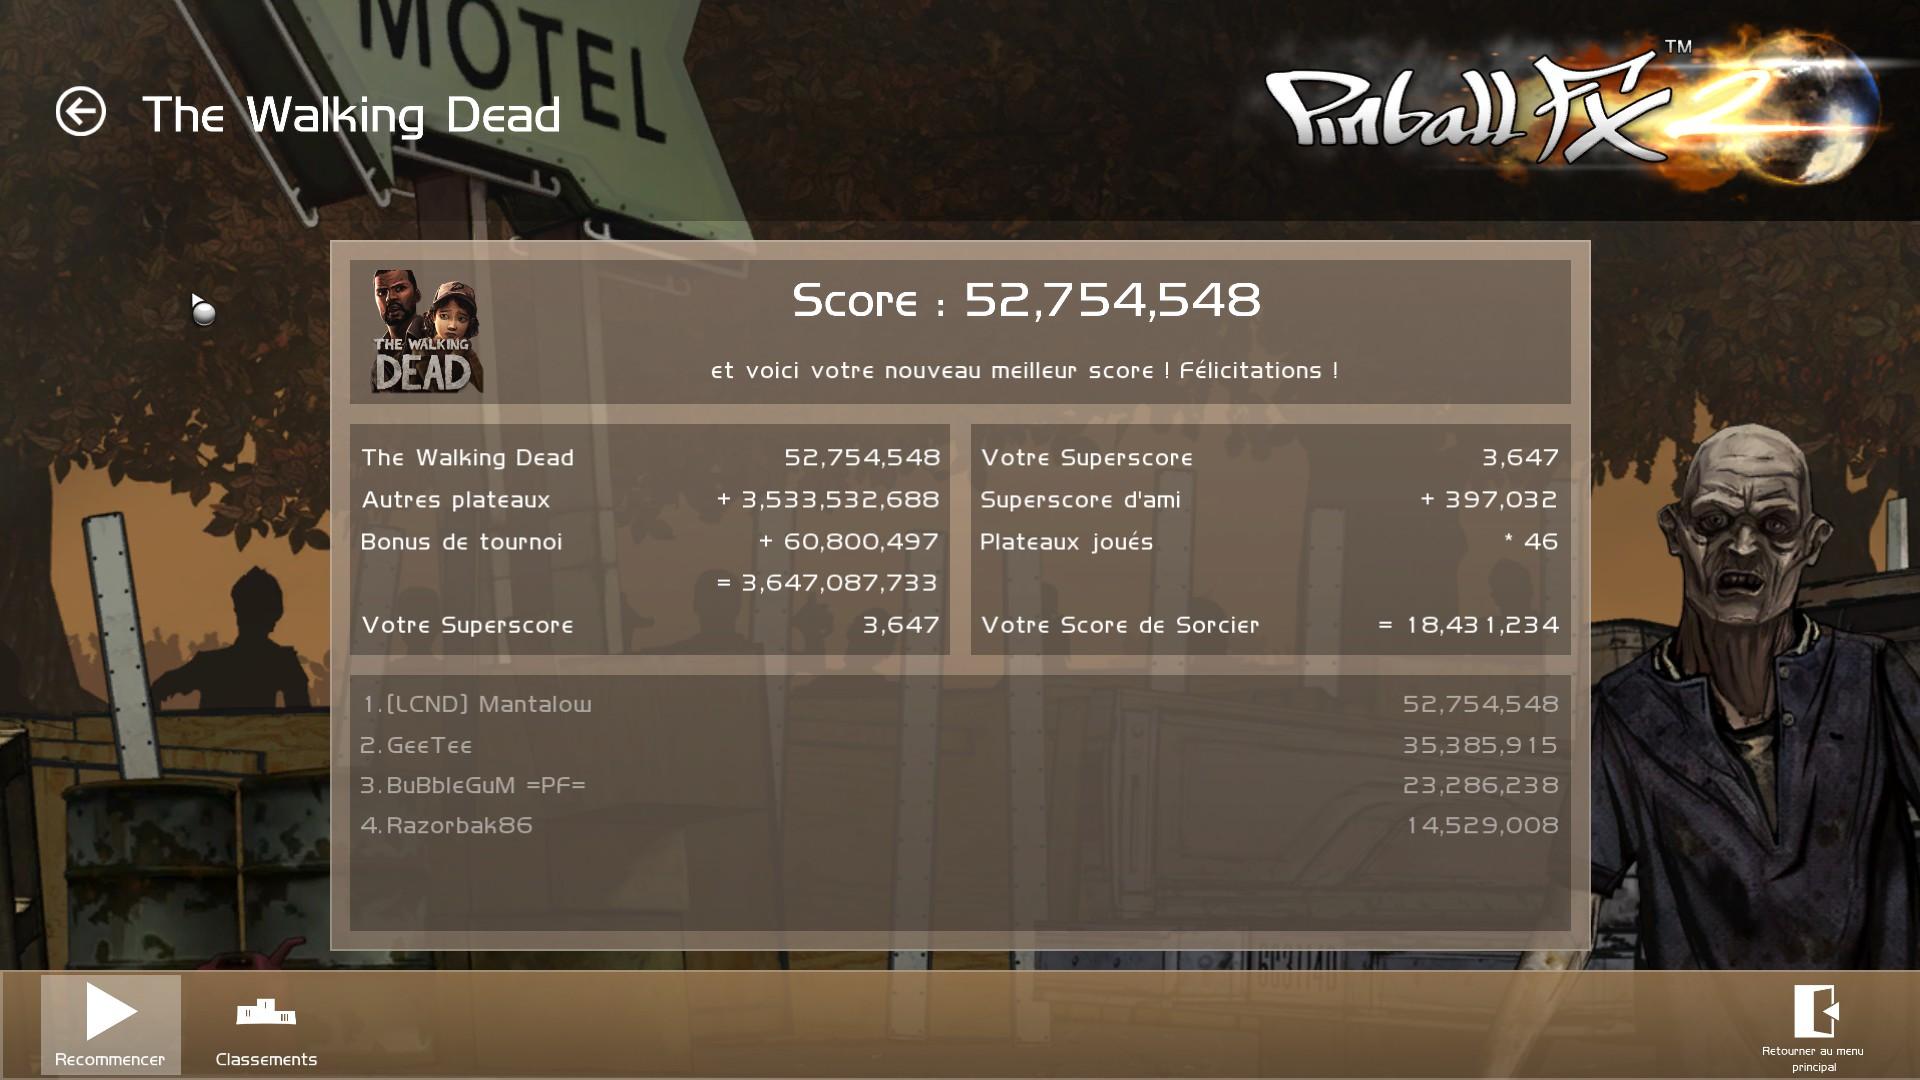 Mantalow: Pinball FX 2: The Walking Dead (PC) 52,754,548 points on 2015-03-05 09:56:45